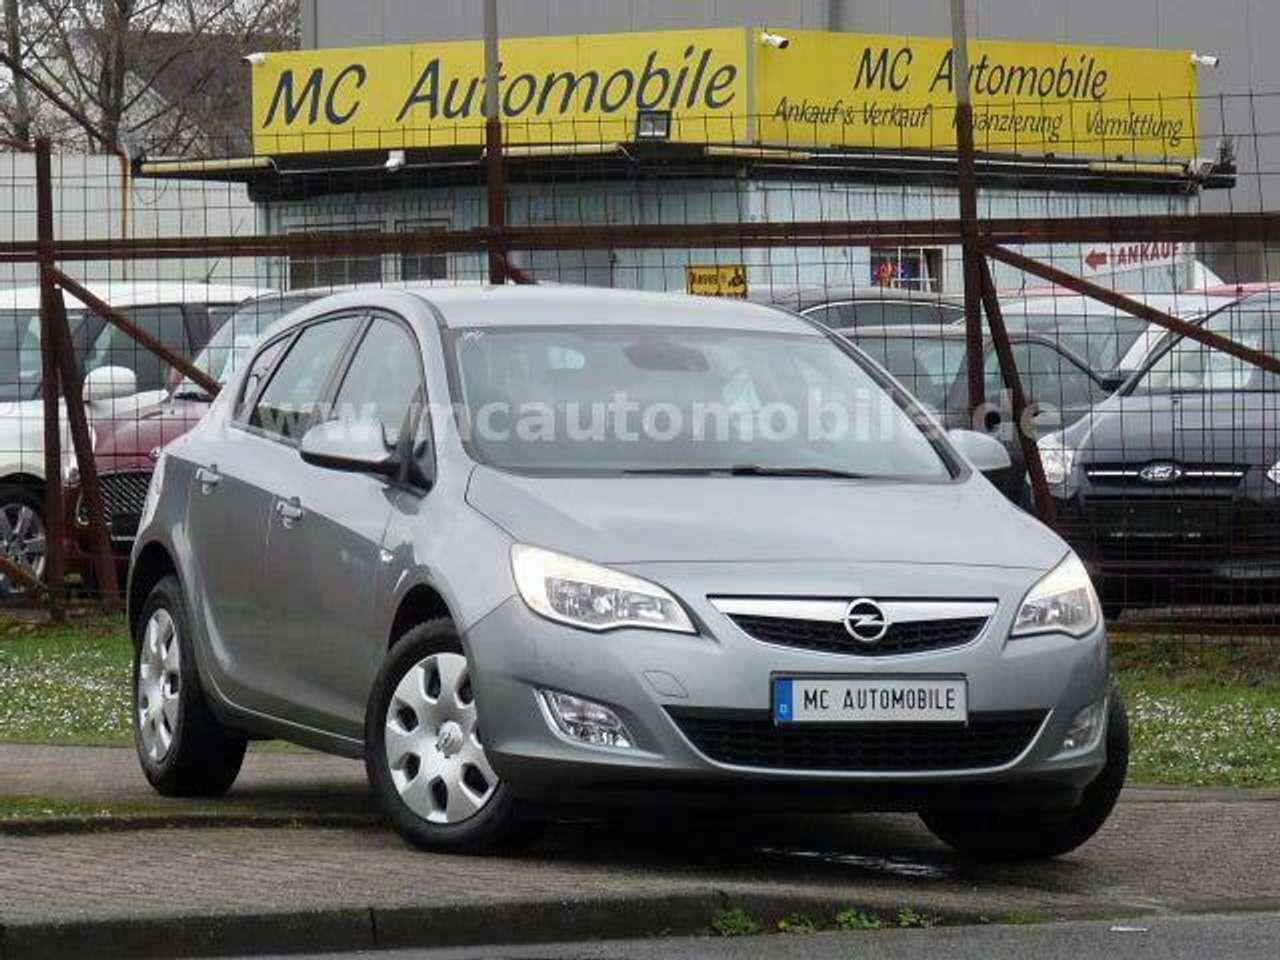 Autos nach Opel Astra 1.4 Turbo